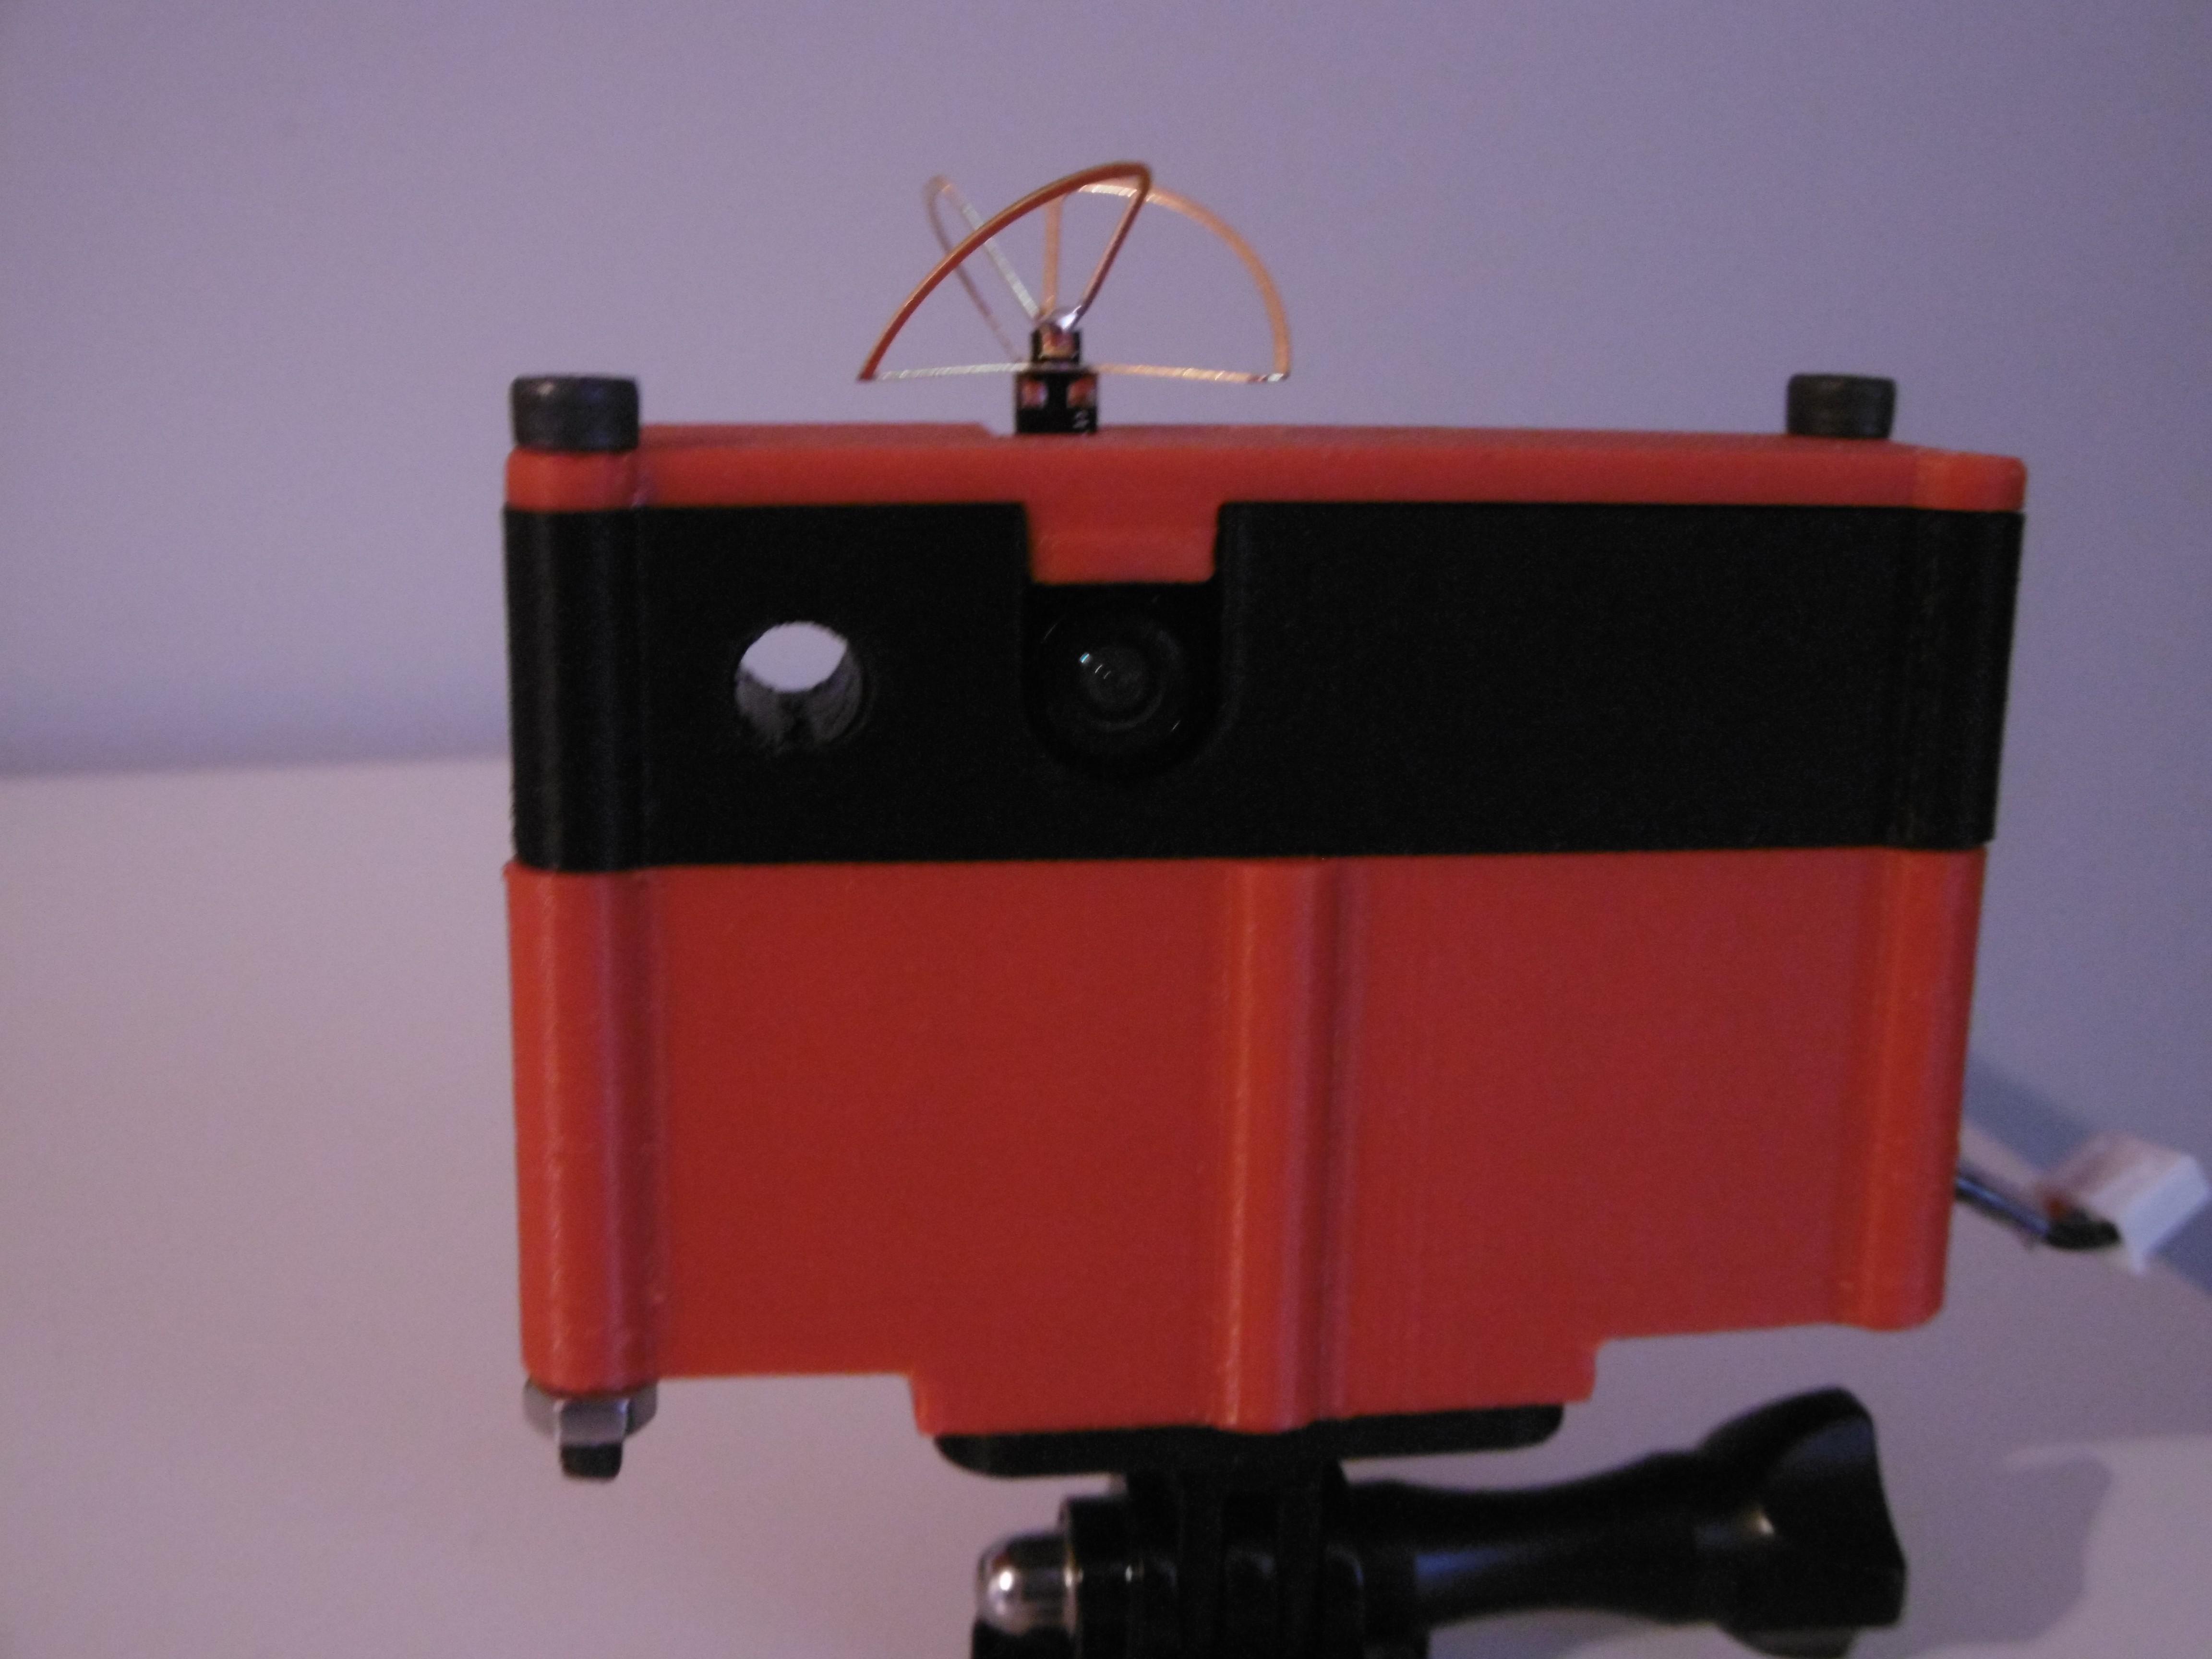 P1000951.JPG Download free STL file 5.8GHz Transmitter Holder with Miniature Camera • 3D printable object, JJB